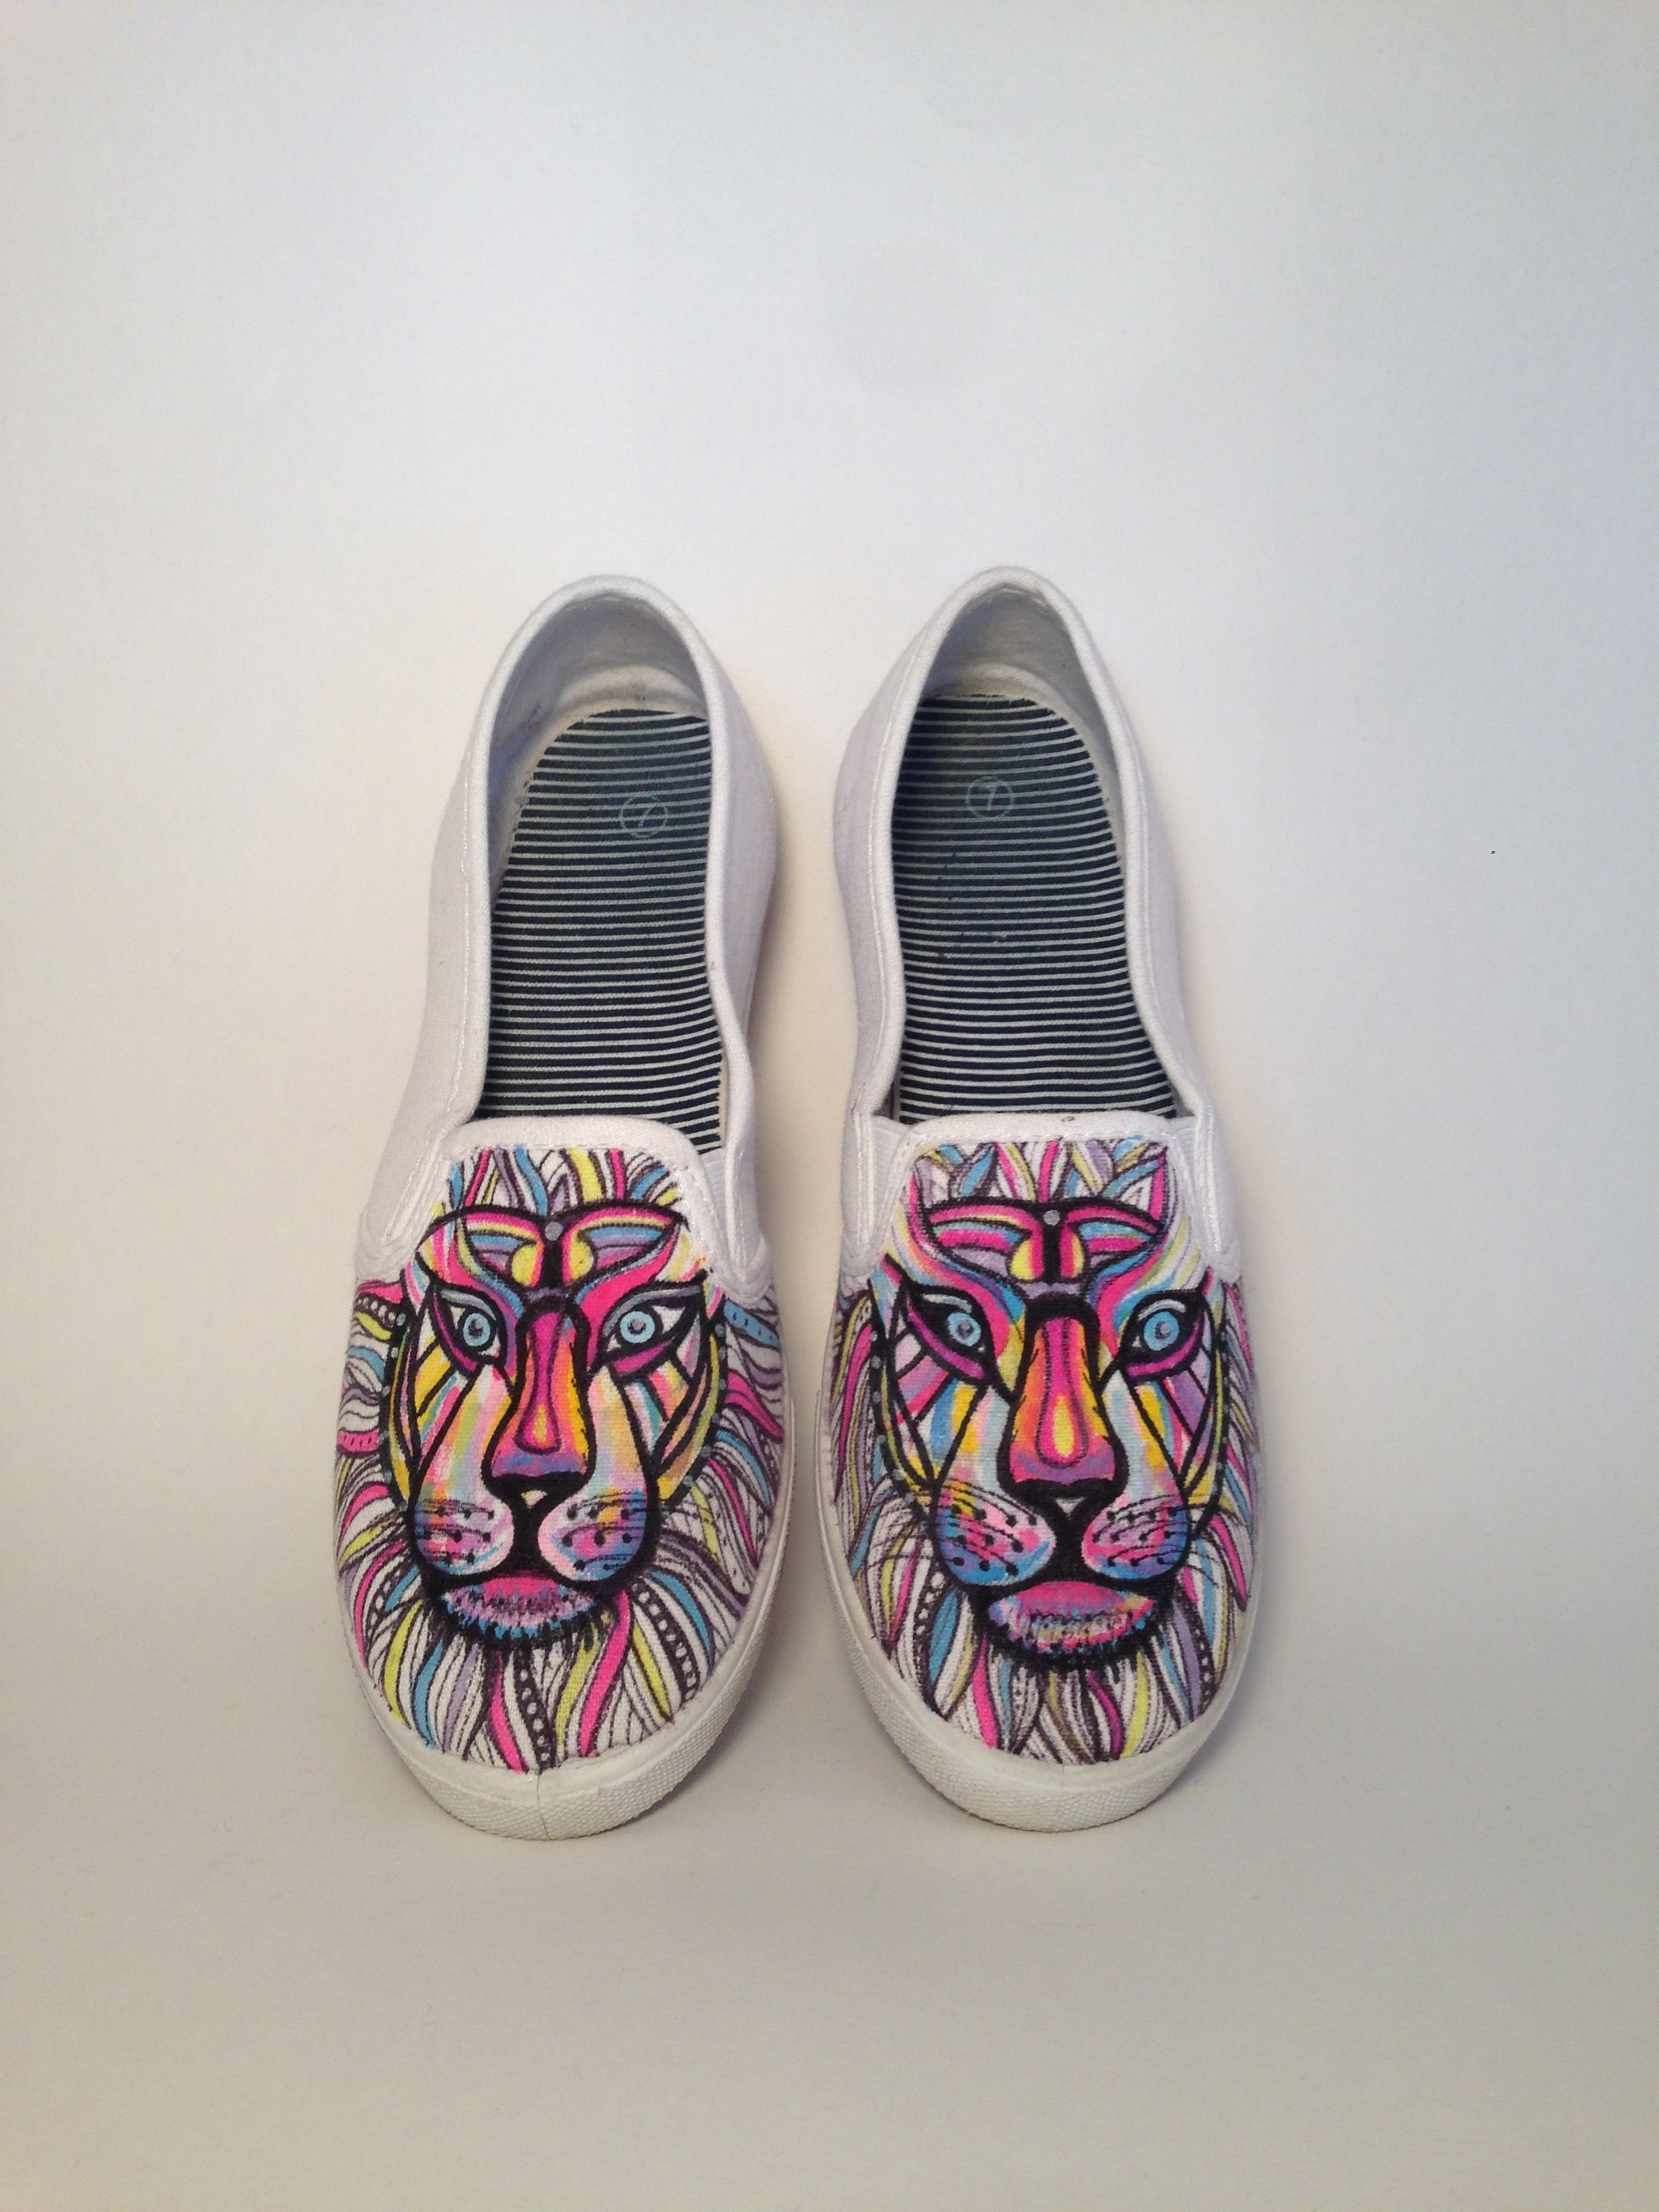 Lion Face Canvas Sneakers | Sharpie shoes, Painted shoes